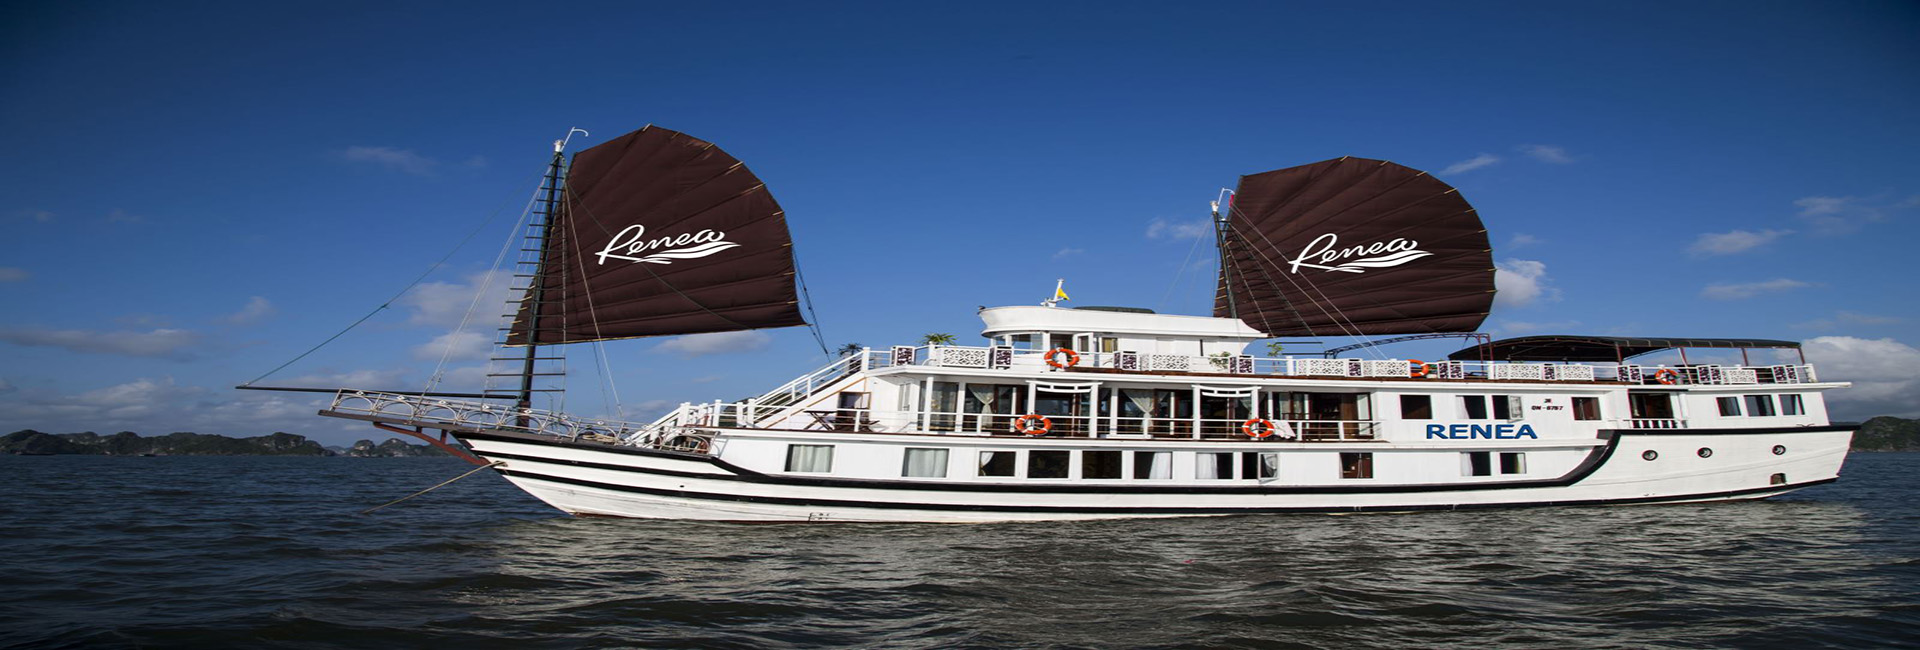 Renea Cruise Boat